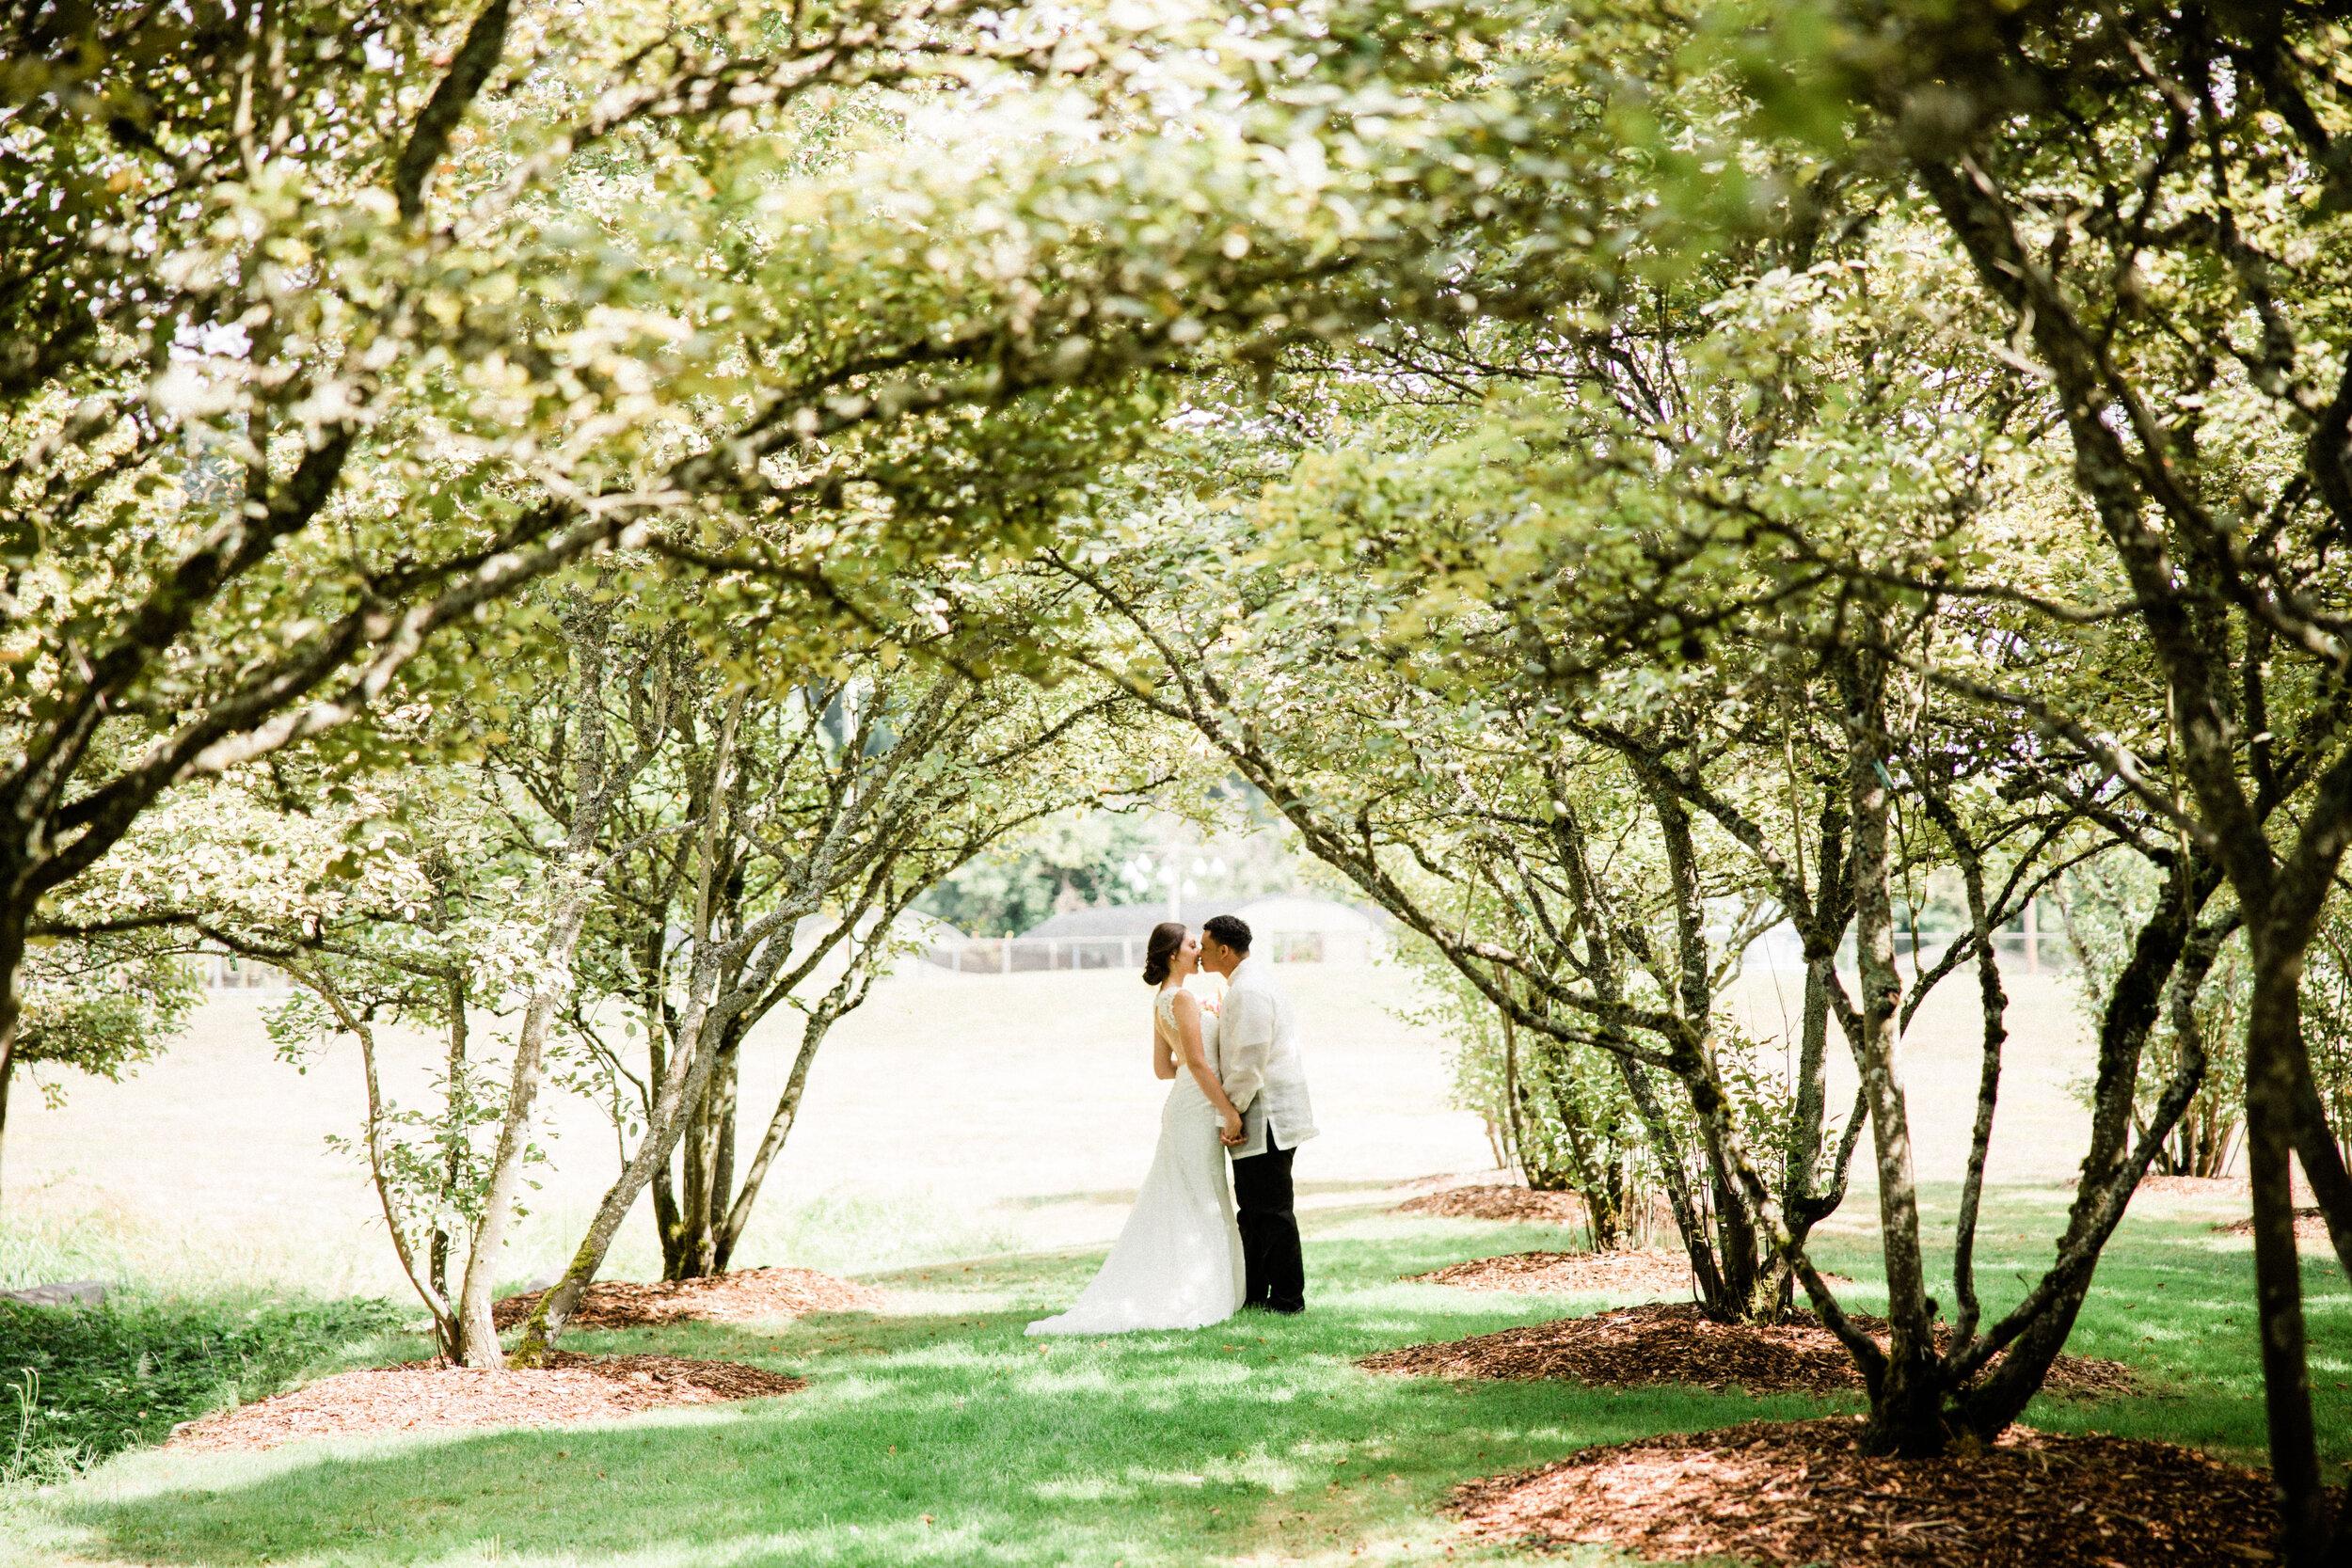 Jonica + Kel - Wedding at UW Center for Urban Horticulture